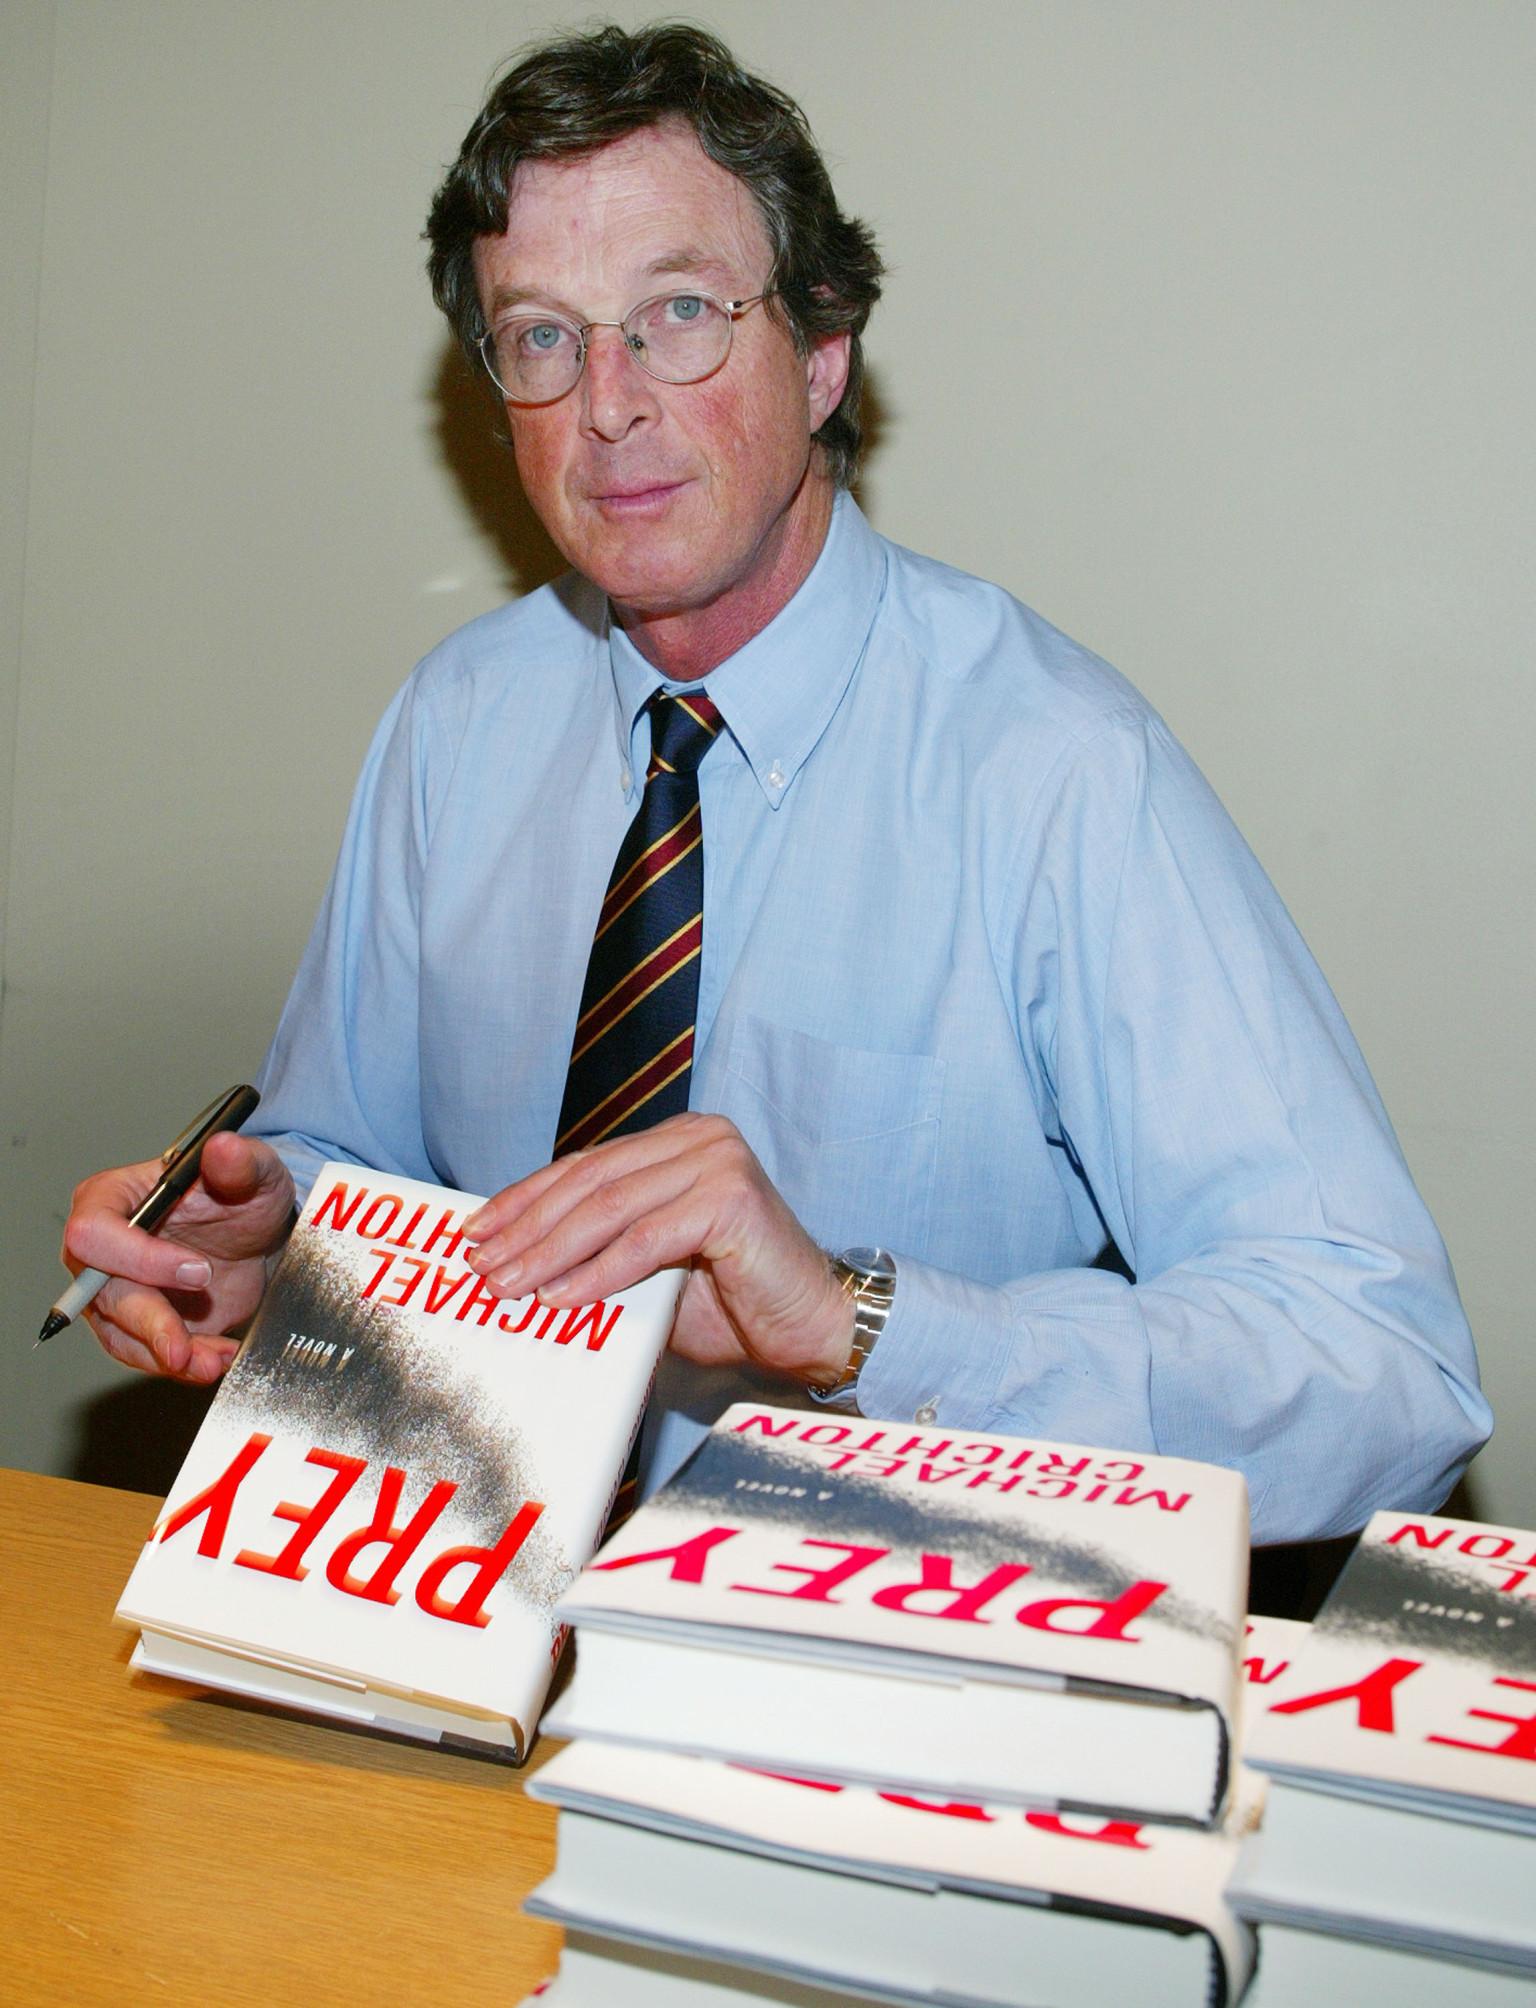 Michael Crichton rising sun